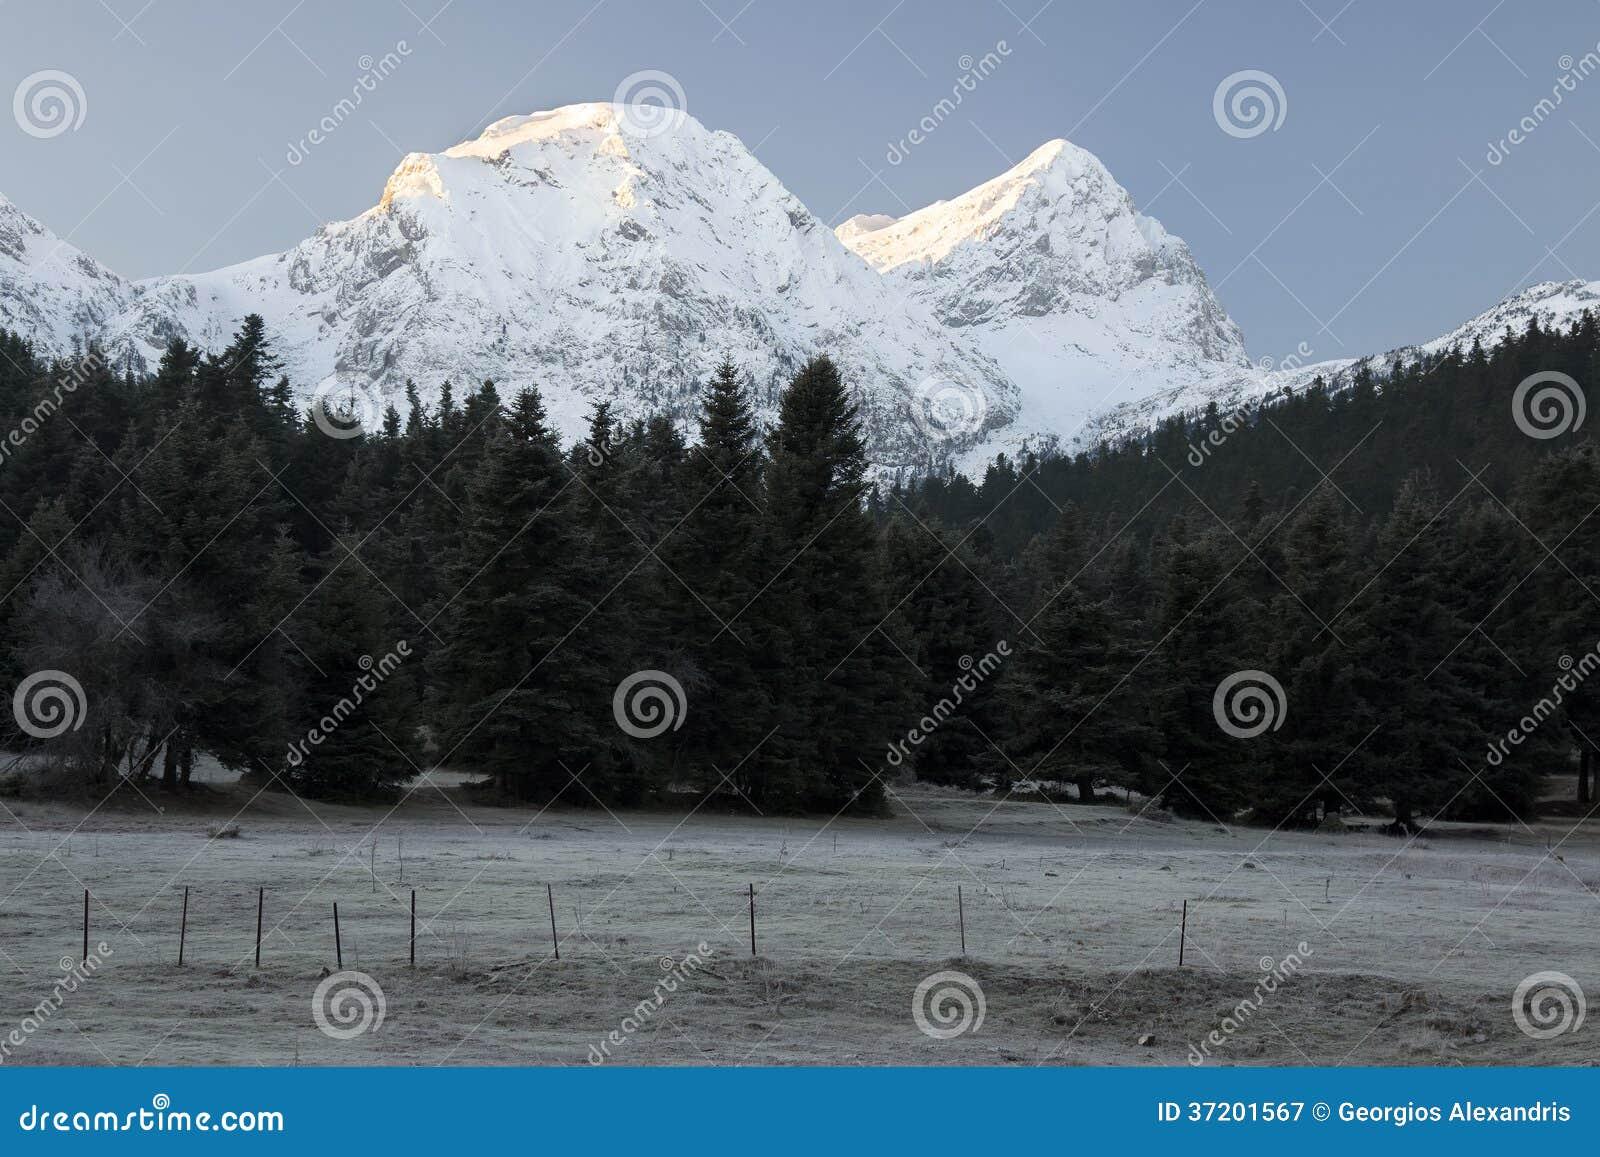 Snowcapped Imágenes De Stock Snowcapped Fotos De Stock: Snowcapped Summits Of Mount Giona, Greece Stock Image